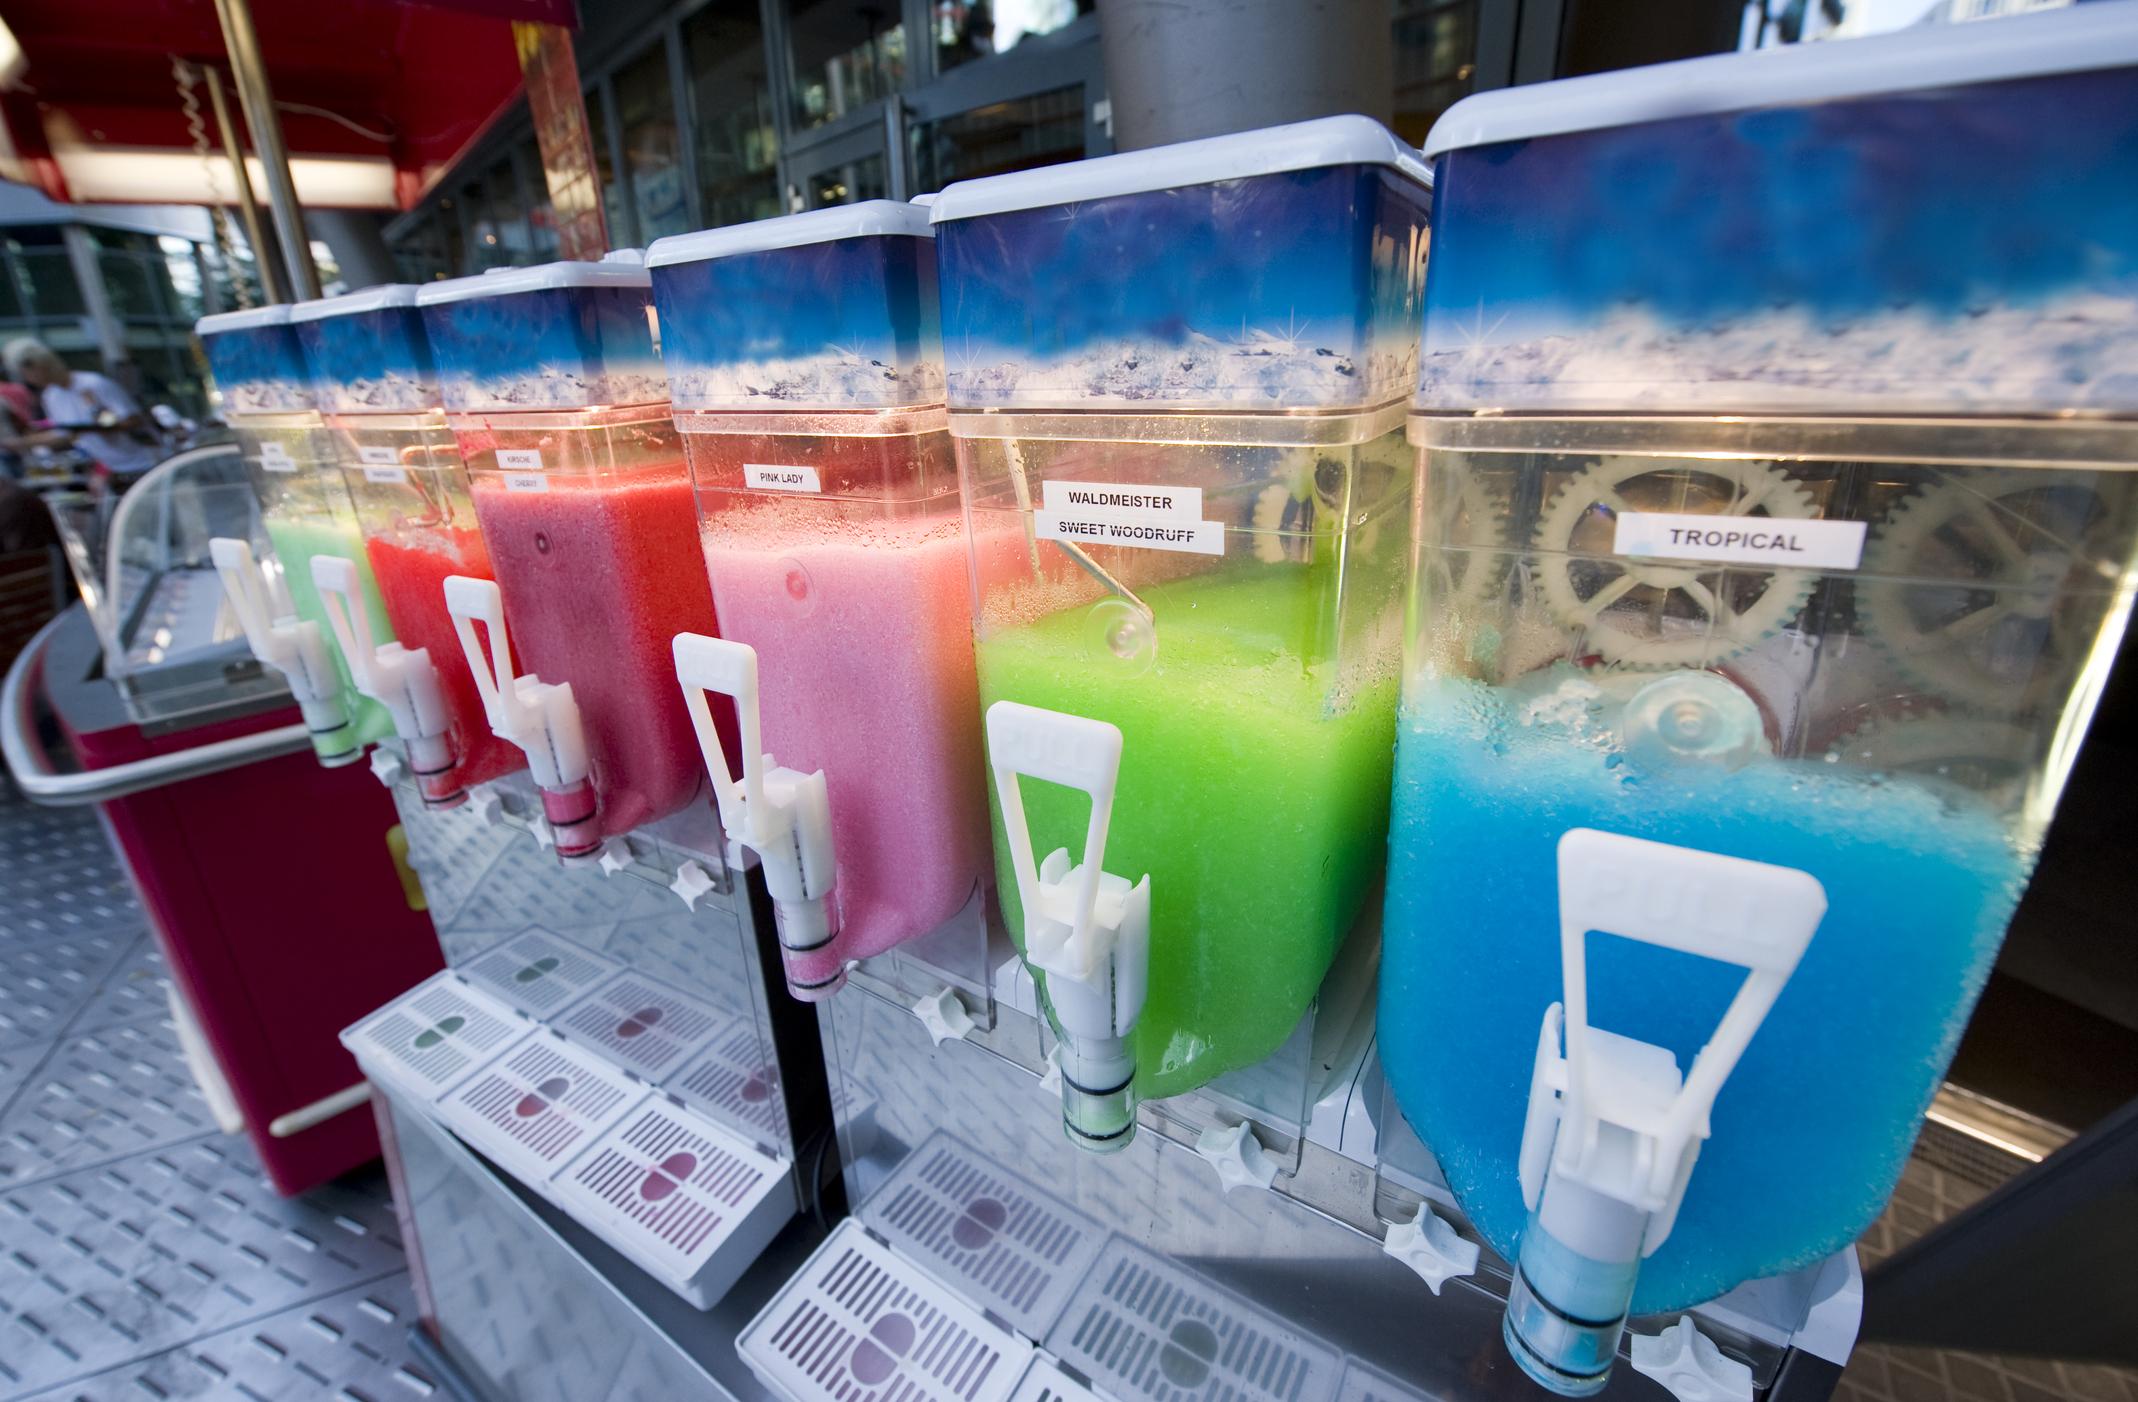 ice-slush-machine-15058501